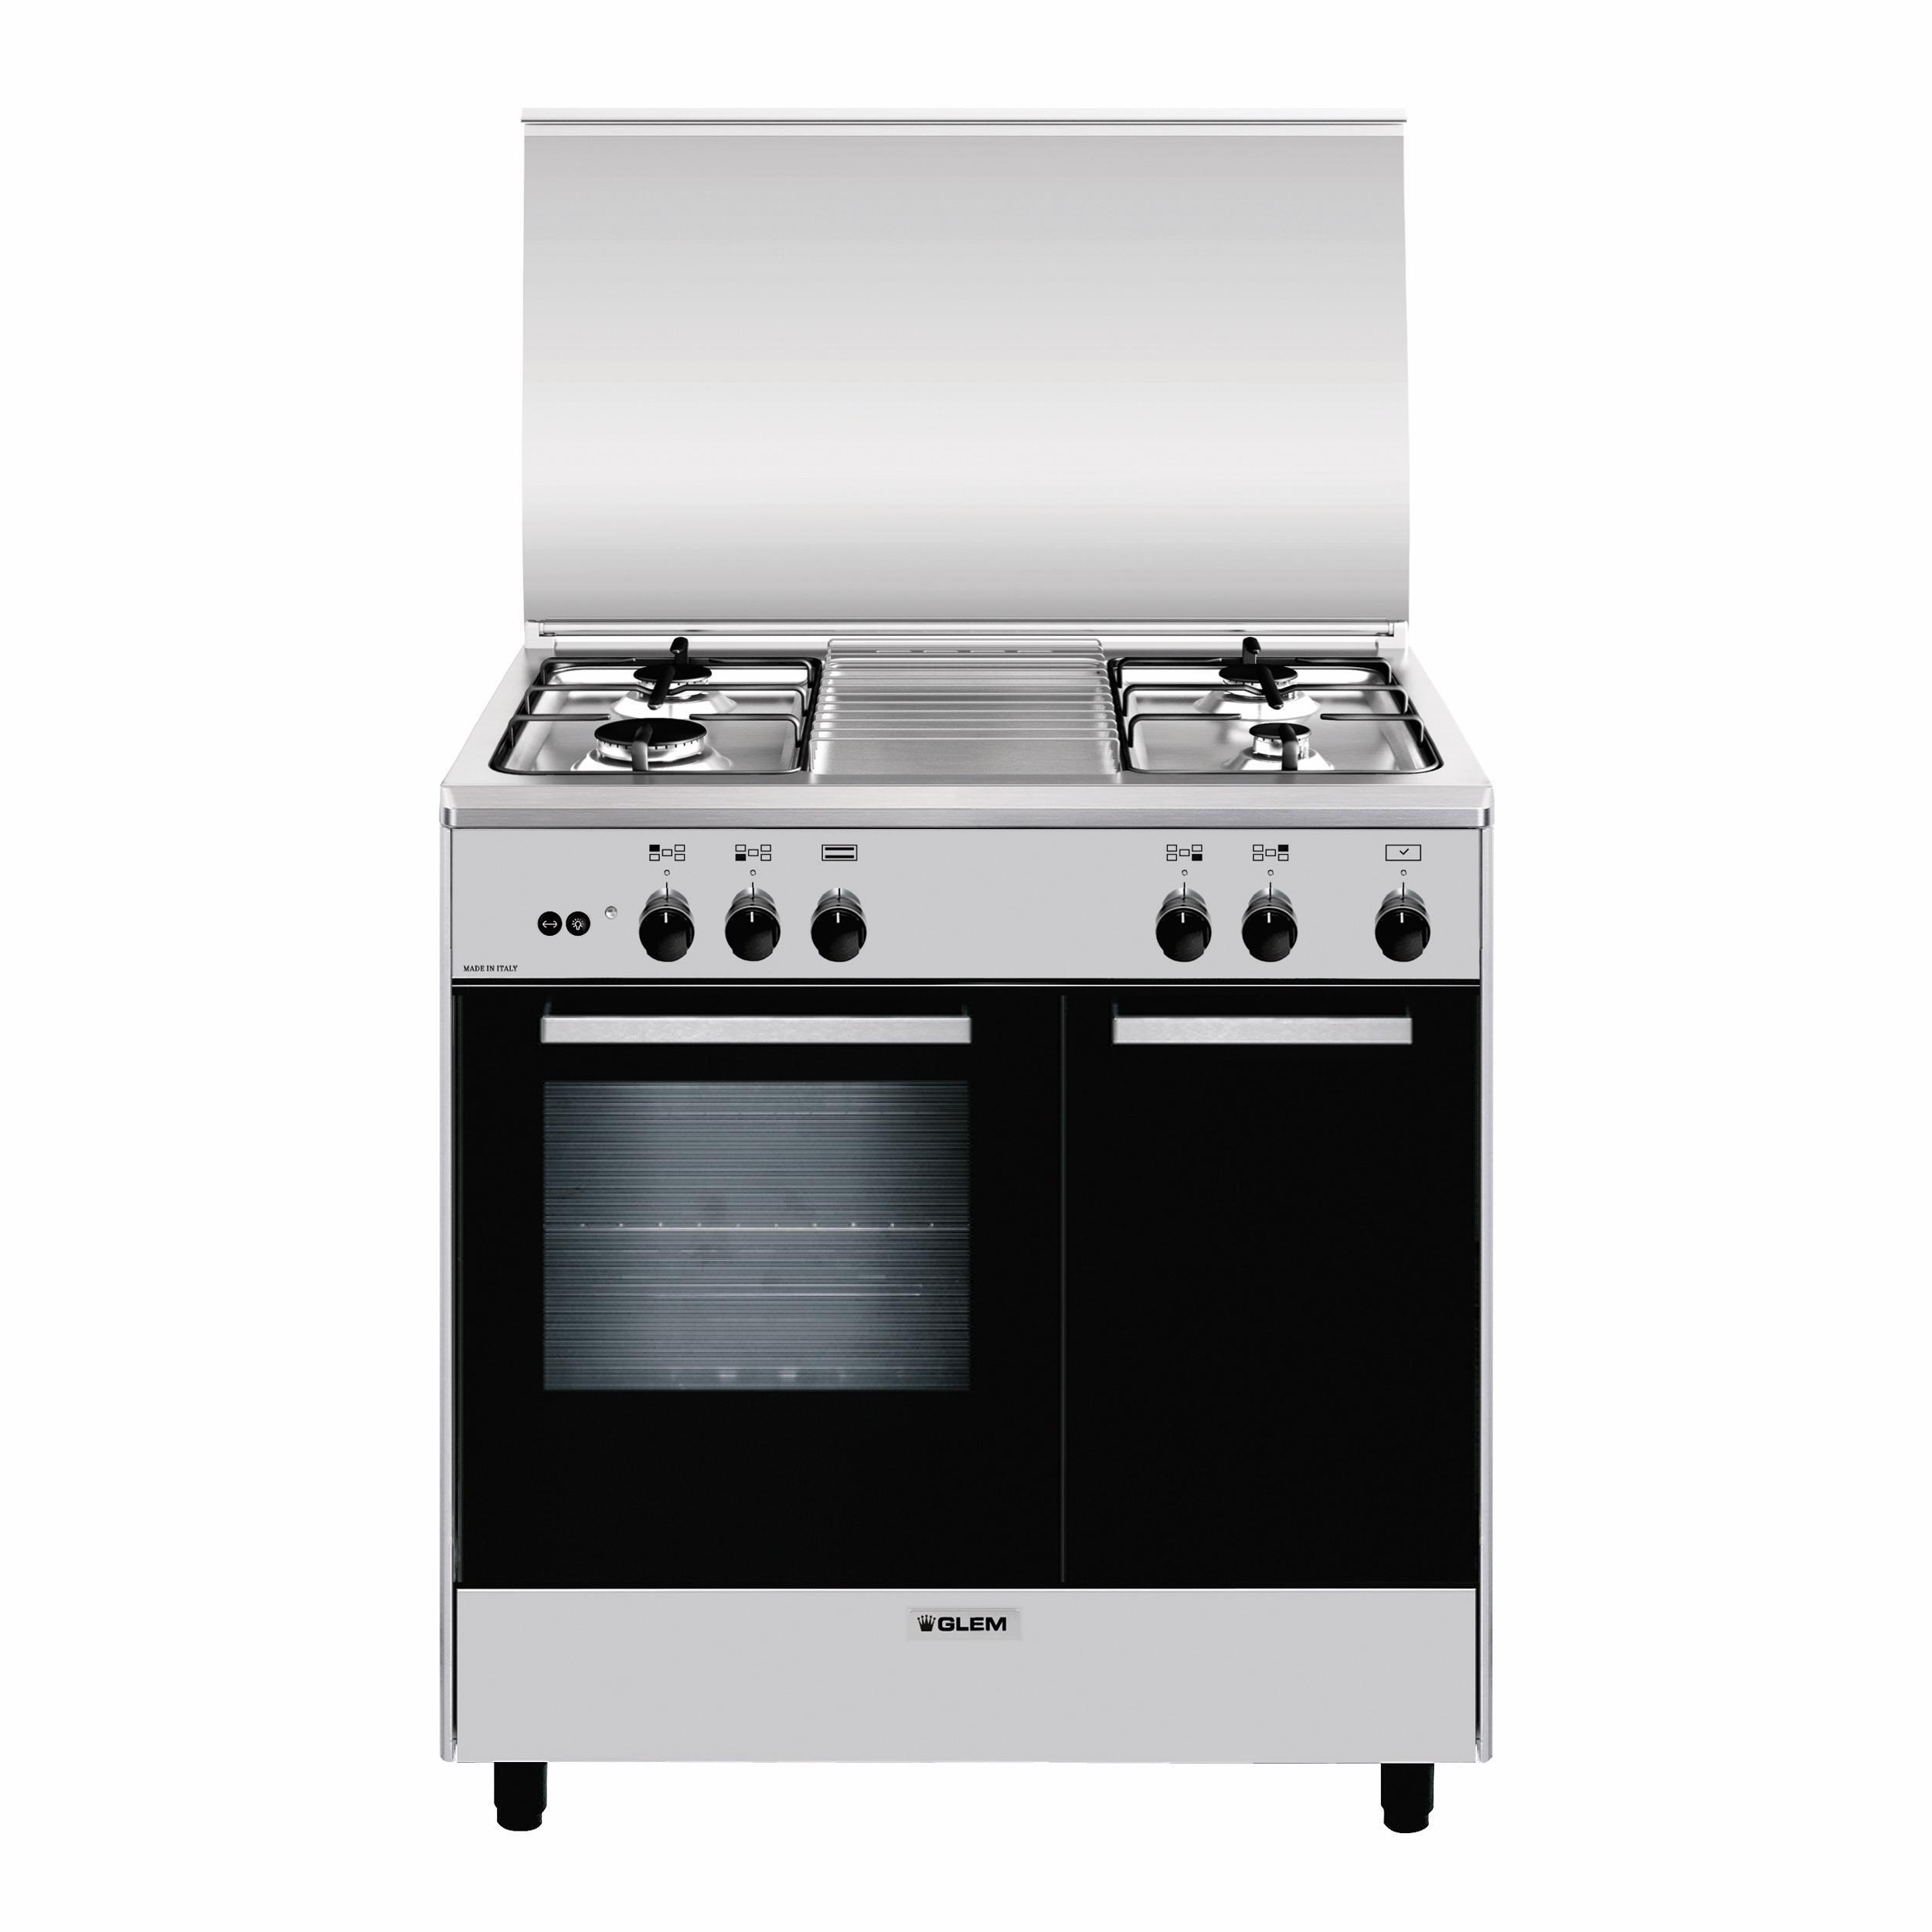 Glem Gas AR854GI cucina Piano cottura Titanio A